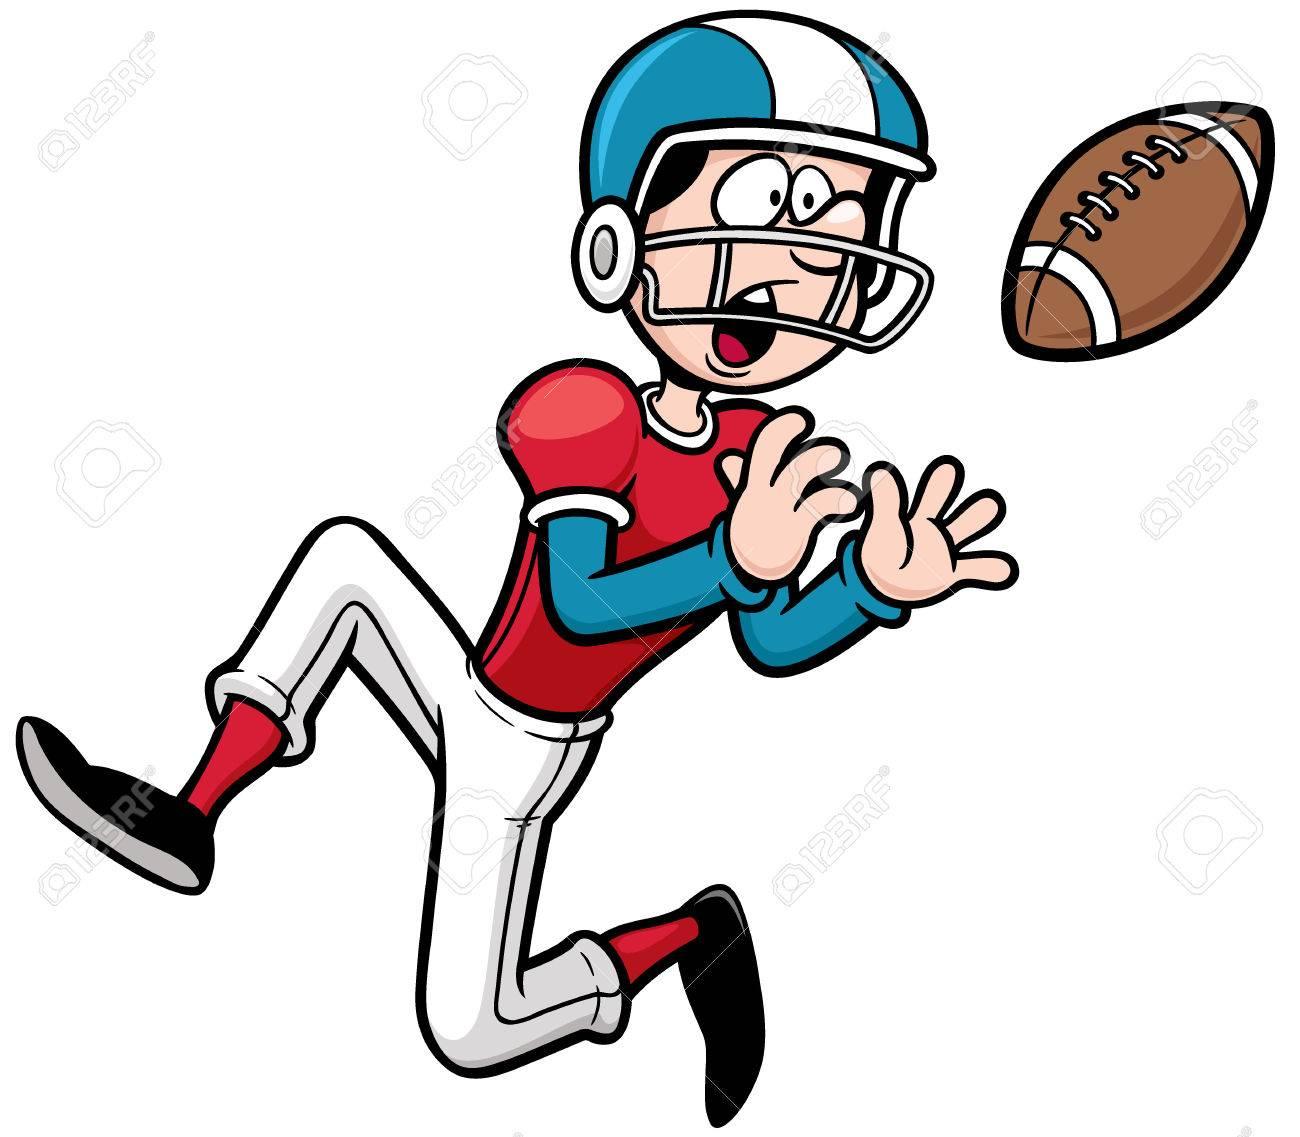 Vector illustration of Cartoon American football player.